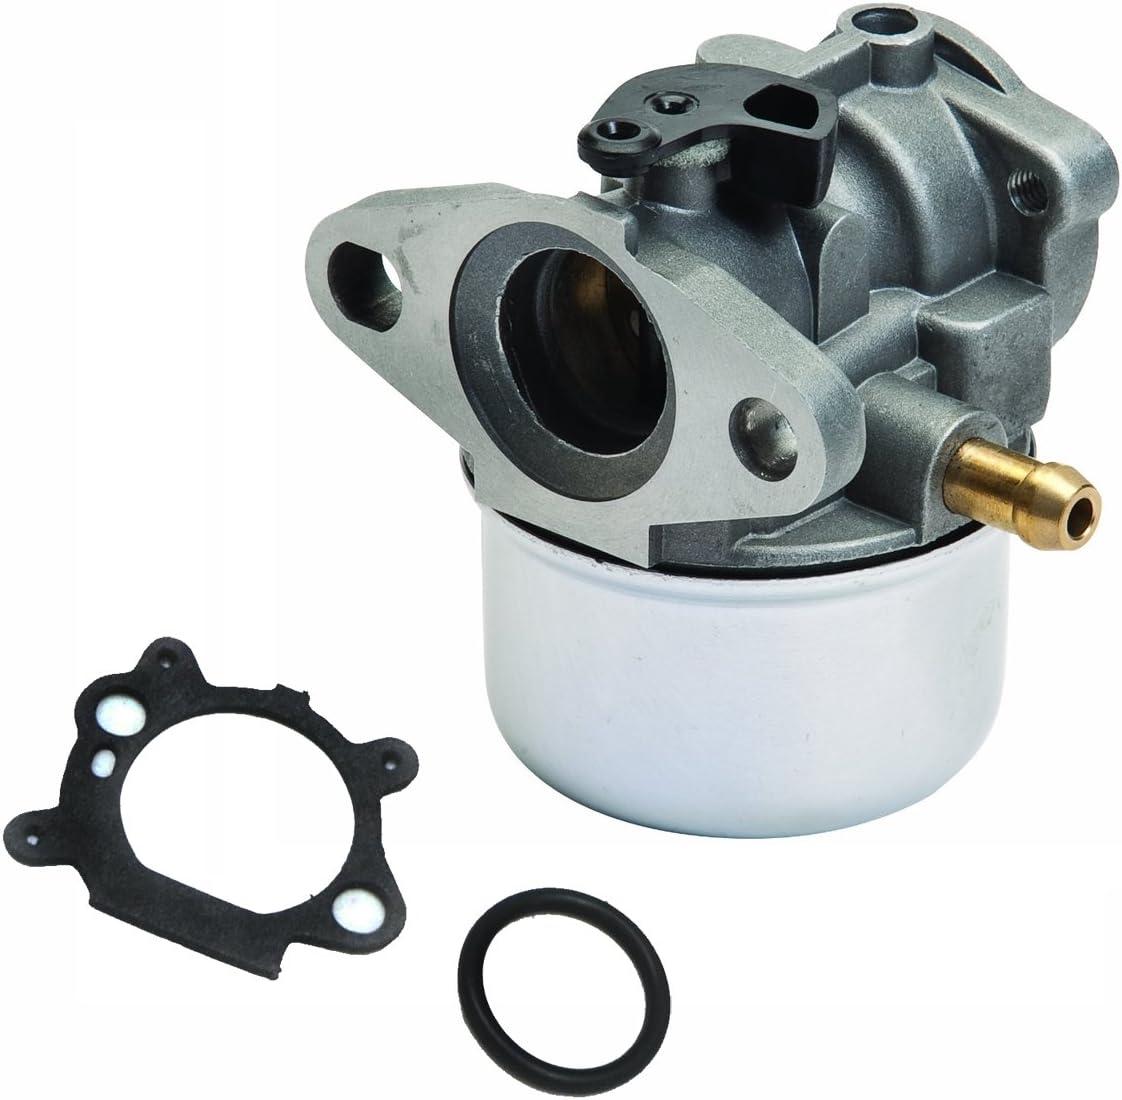 amazon.com: procompany carburetor replaces for briggs & stratton ... brigg stratton lawn mower carburetor diagram 498170  amazon.com